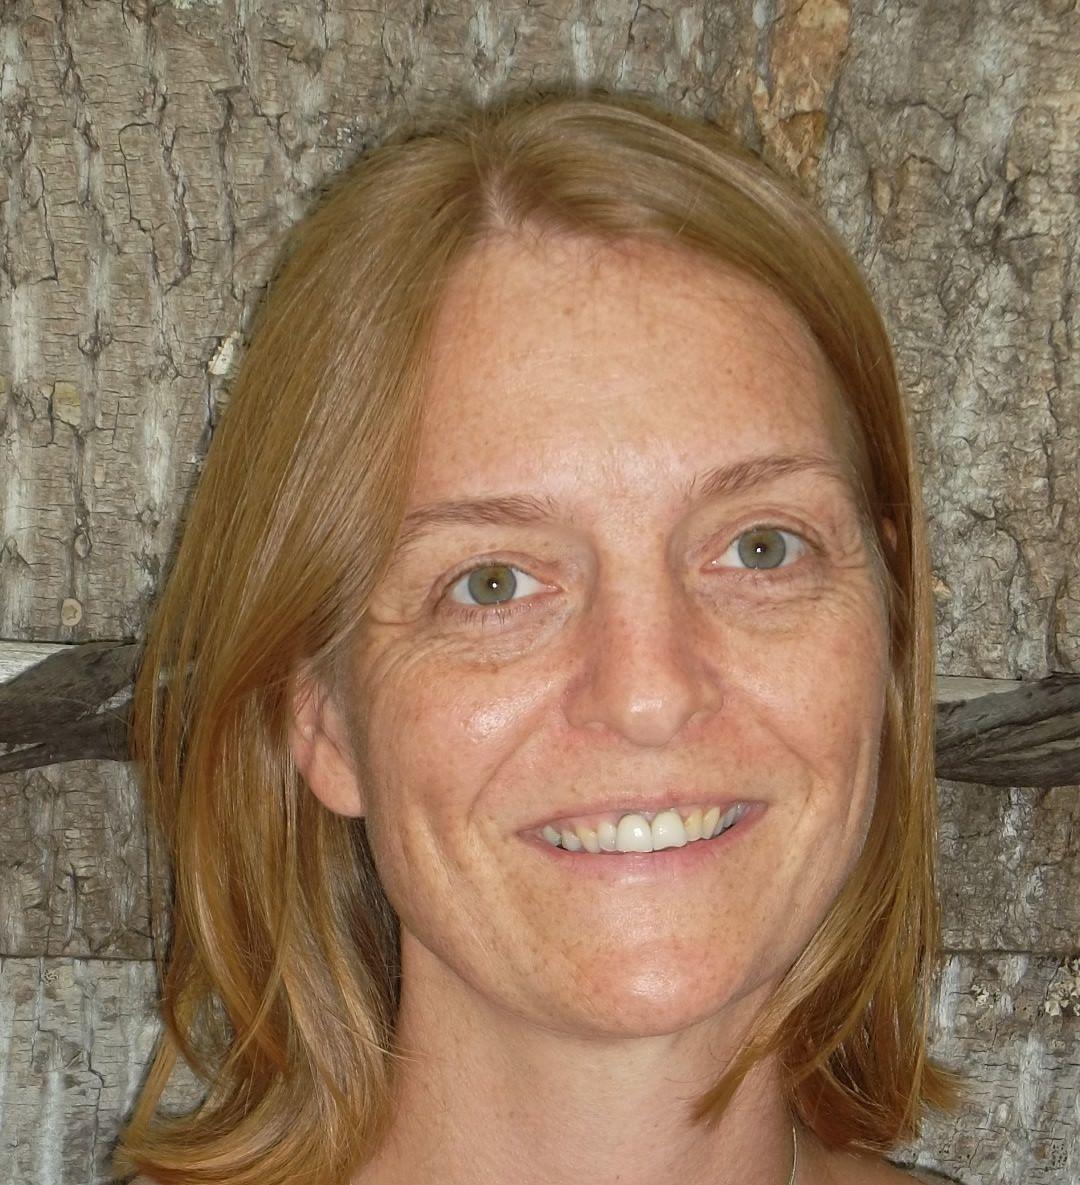 Amanda Jaros